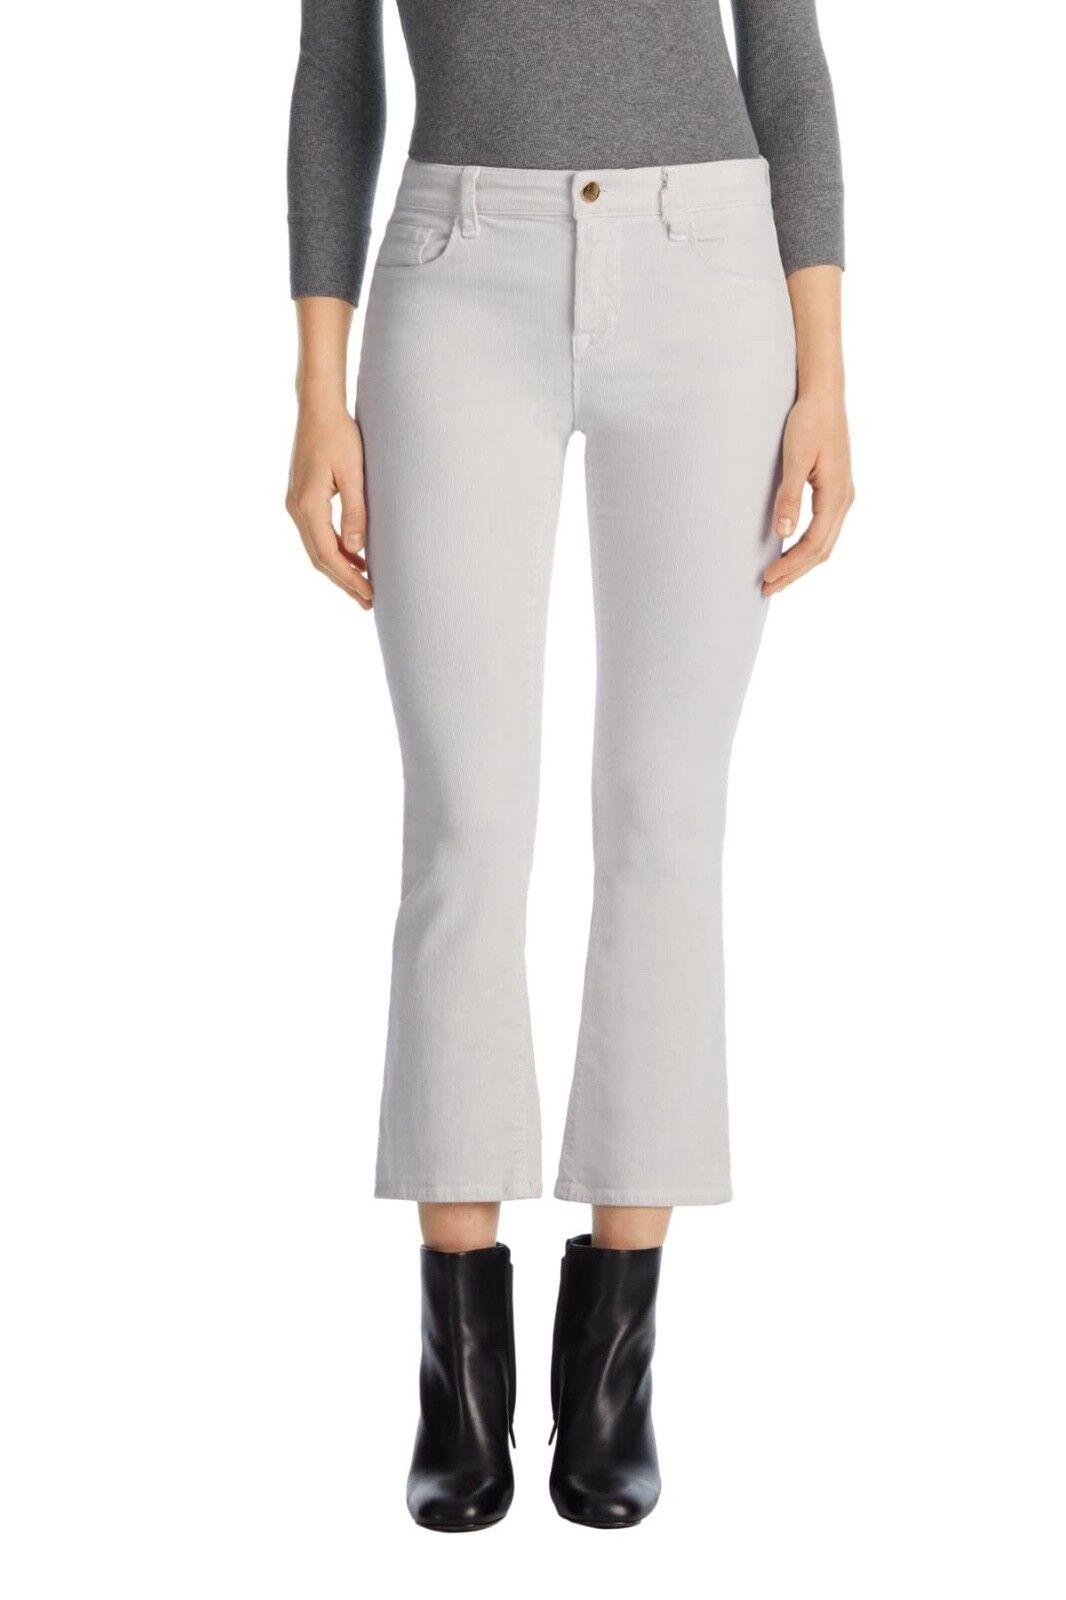 nyA J BRAND Selena Mid Rise Cropped Boocut Jean in Moonbeam - Storlek 29